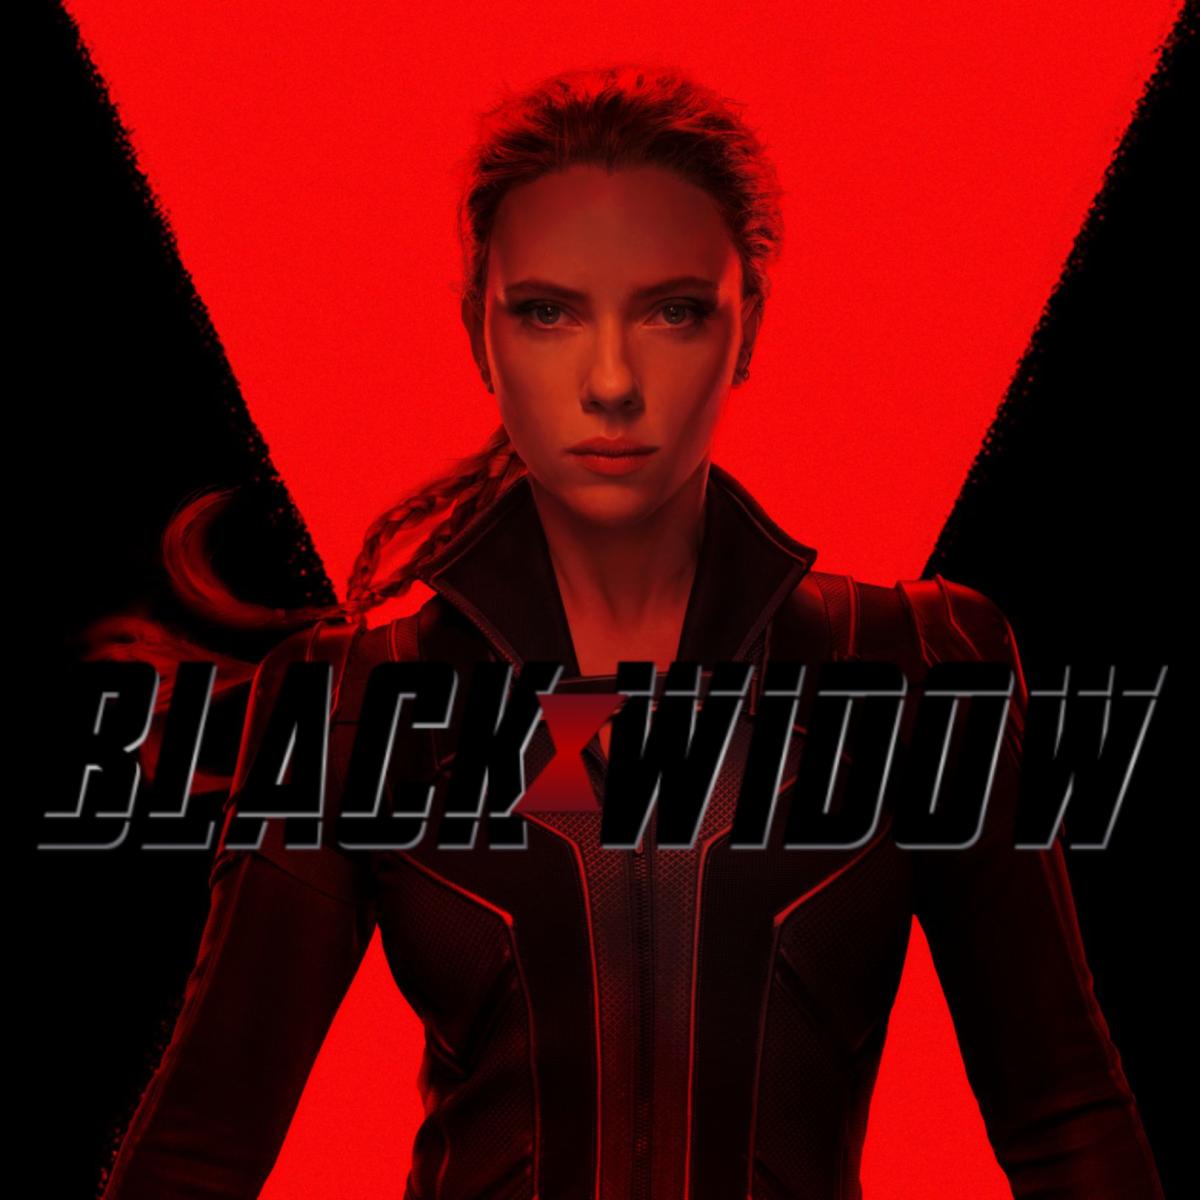 was-black-widow-worth-the-wait